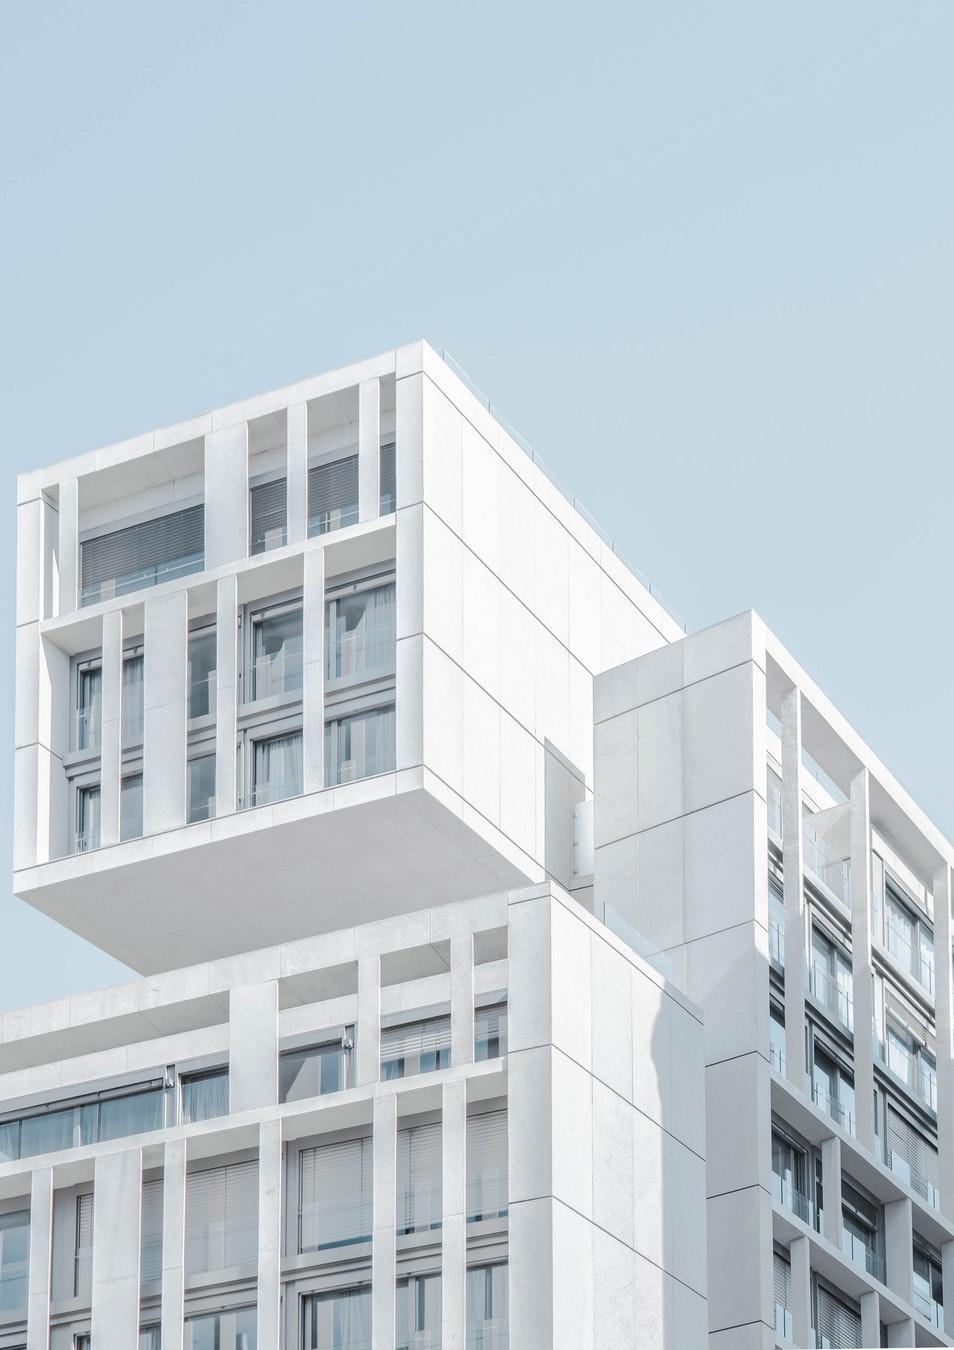 ModULAR CONSTRUCTION -